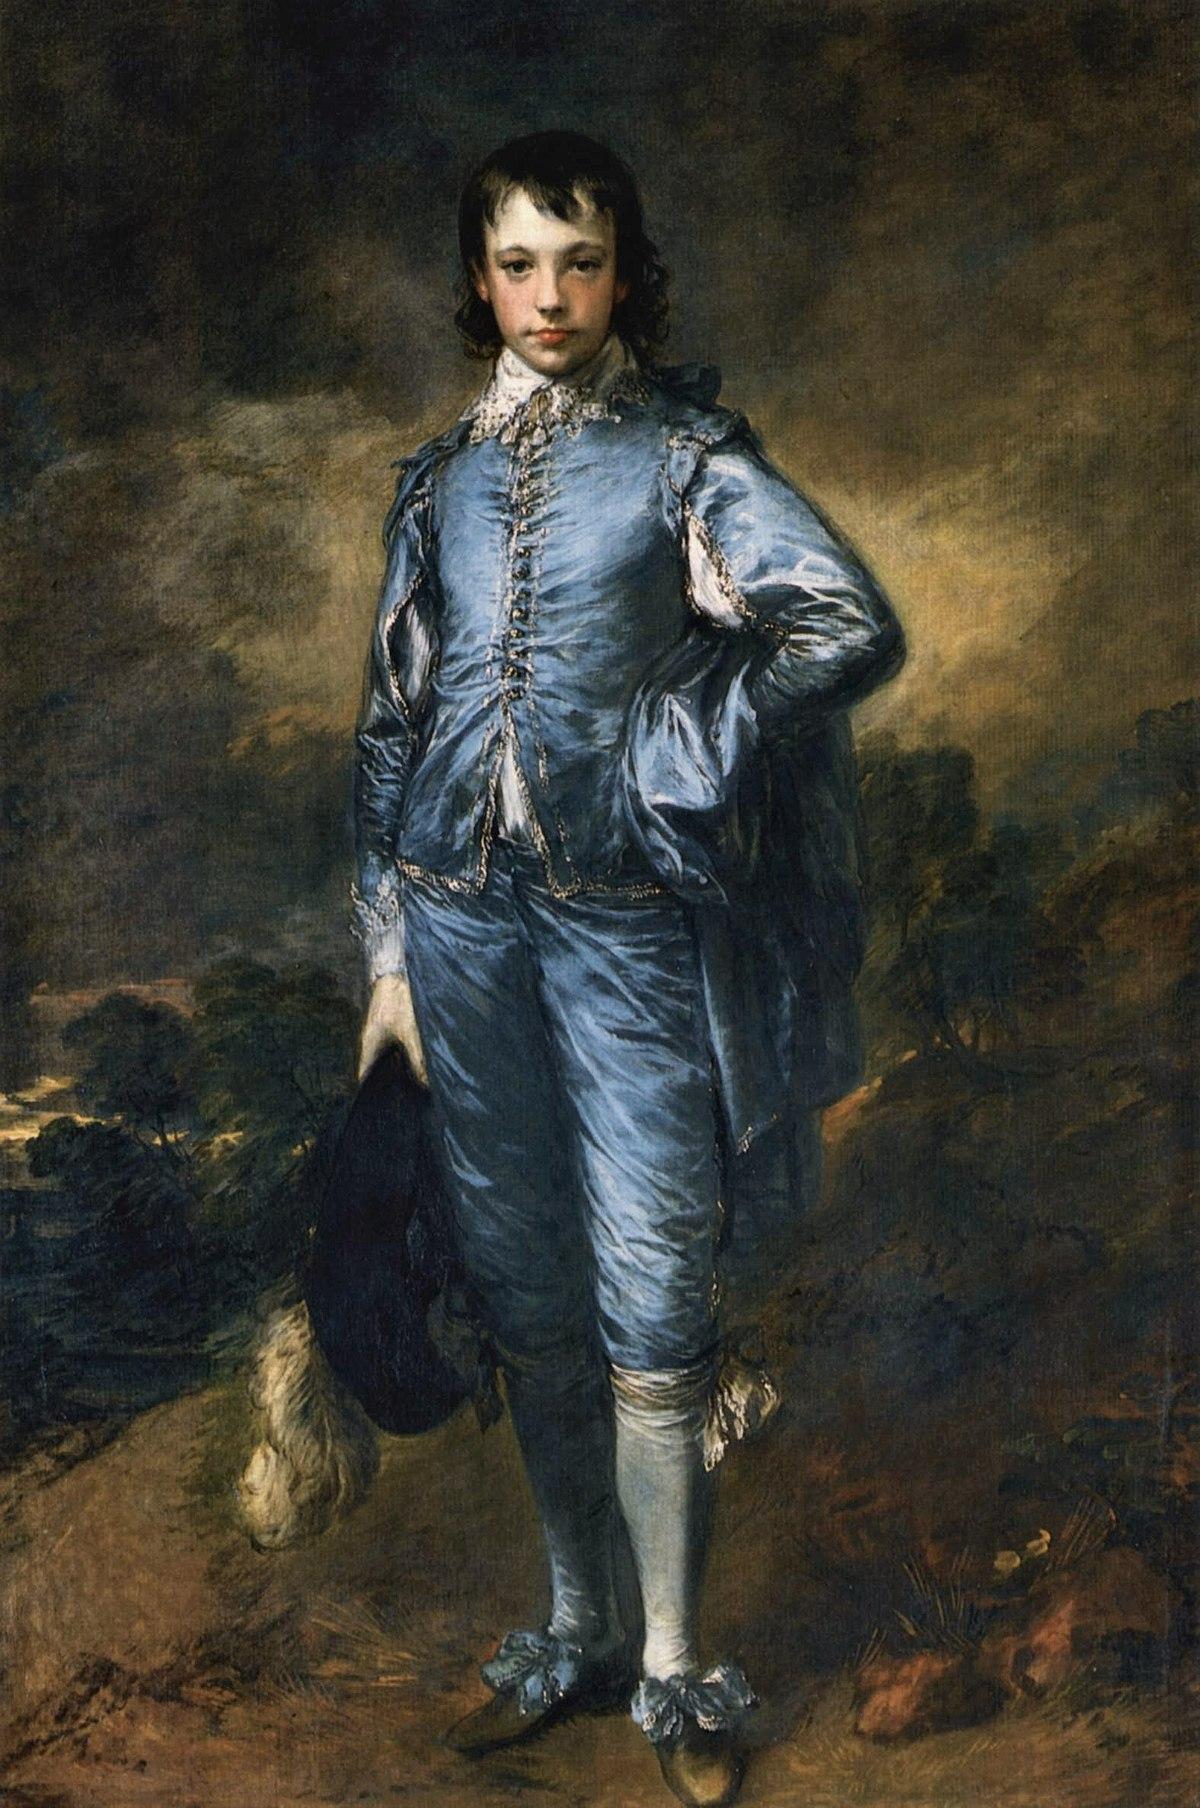 Thomas Gainsborough. Blue boy, hacia 1770